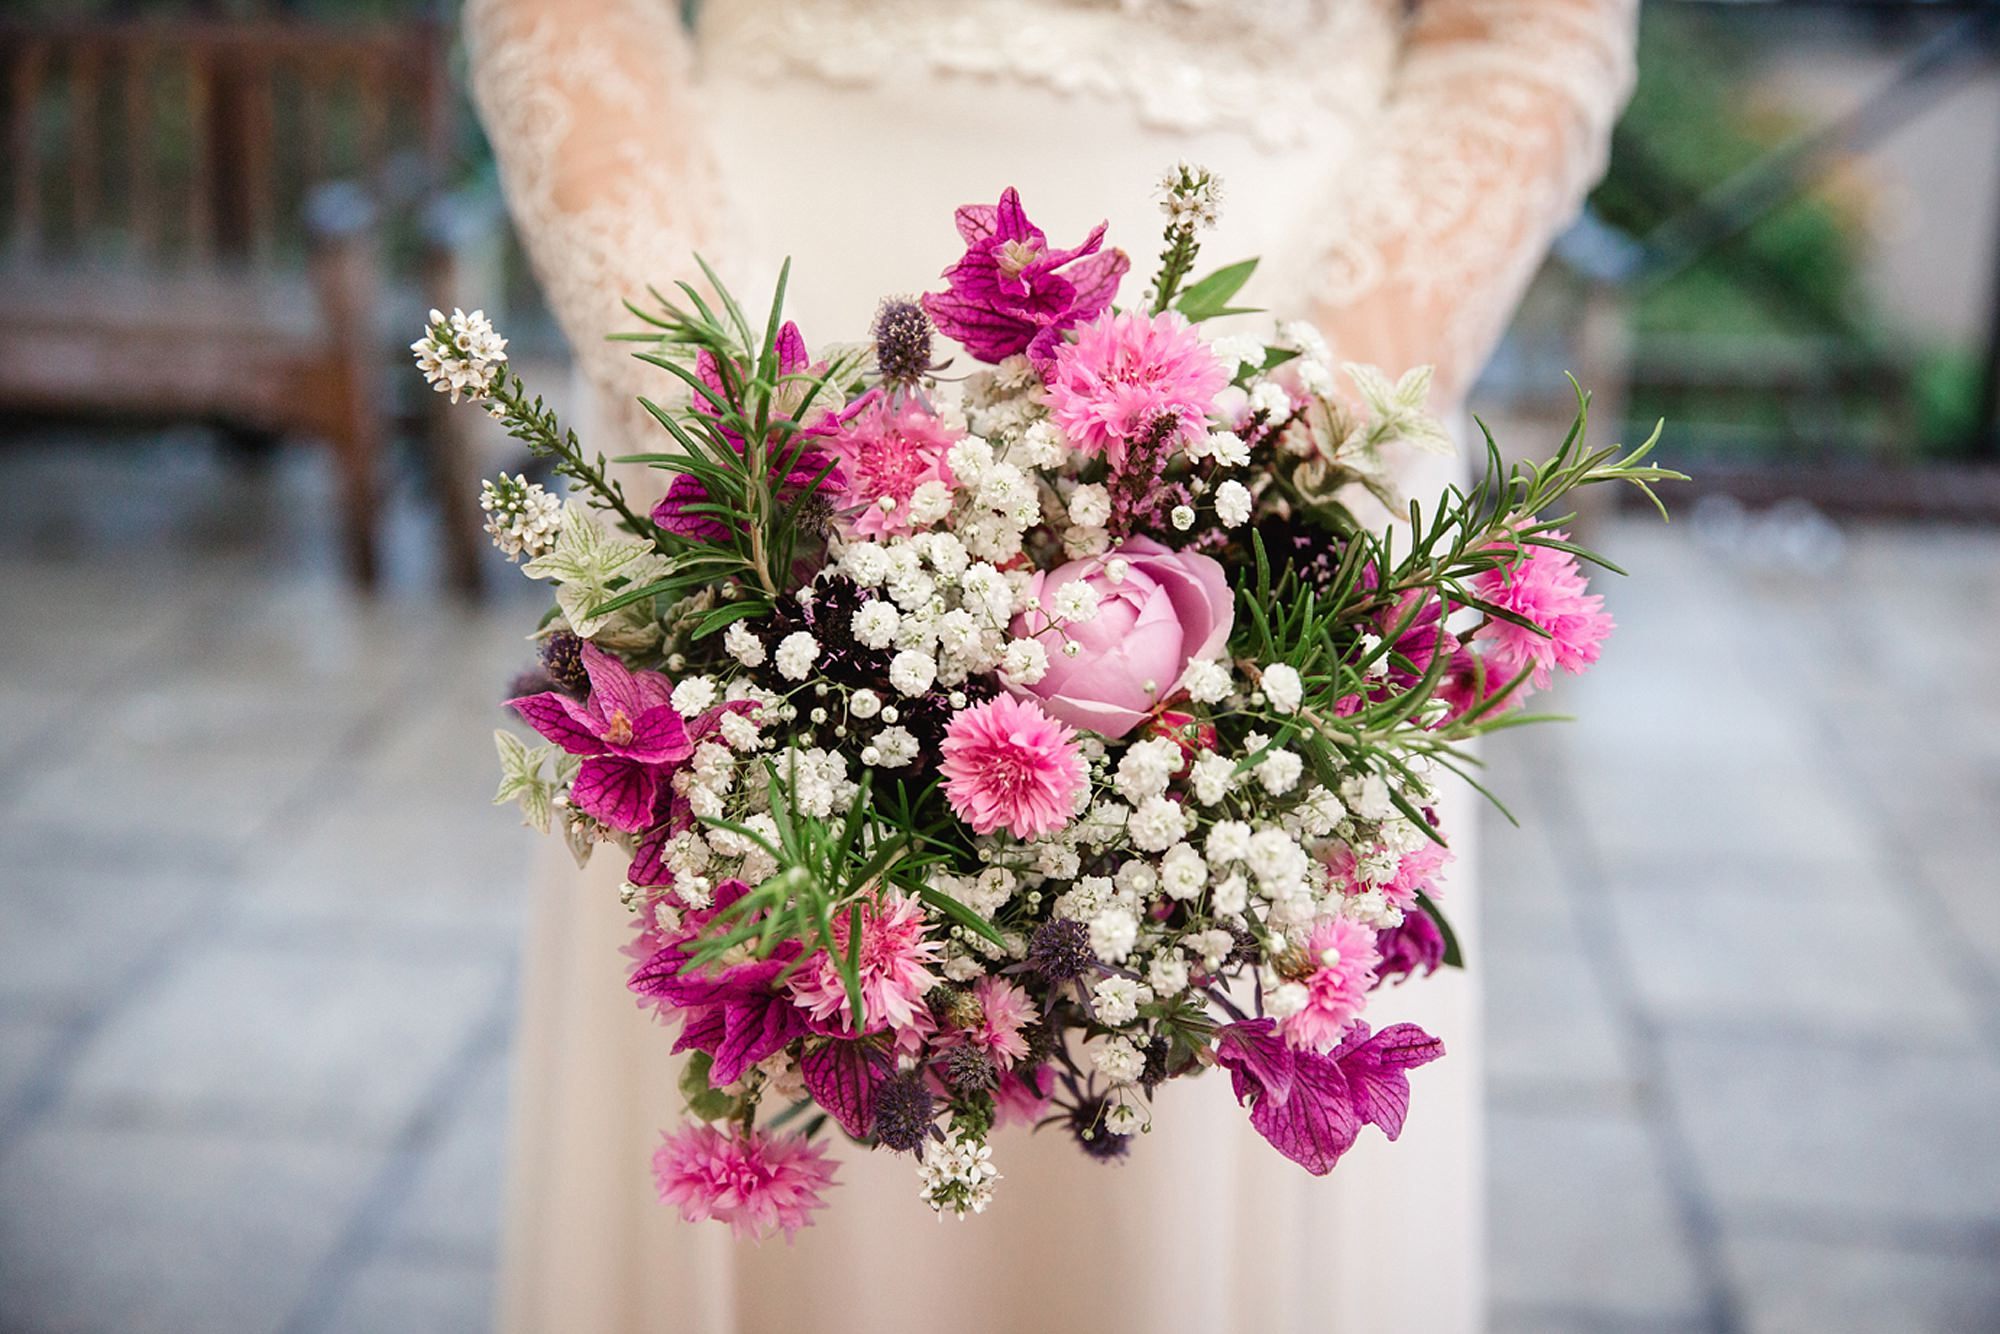 Marks Hall Estate wedding photography bride's bouquet